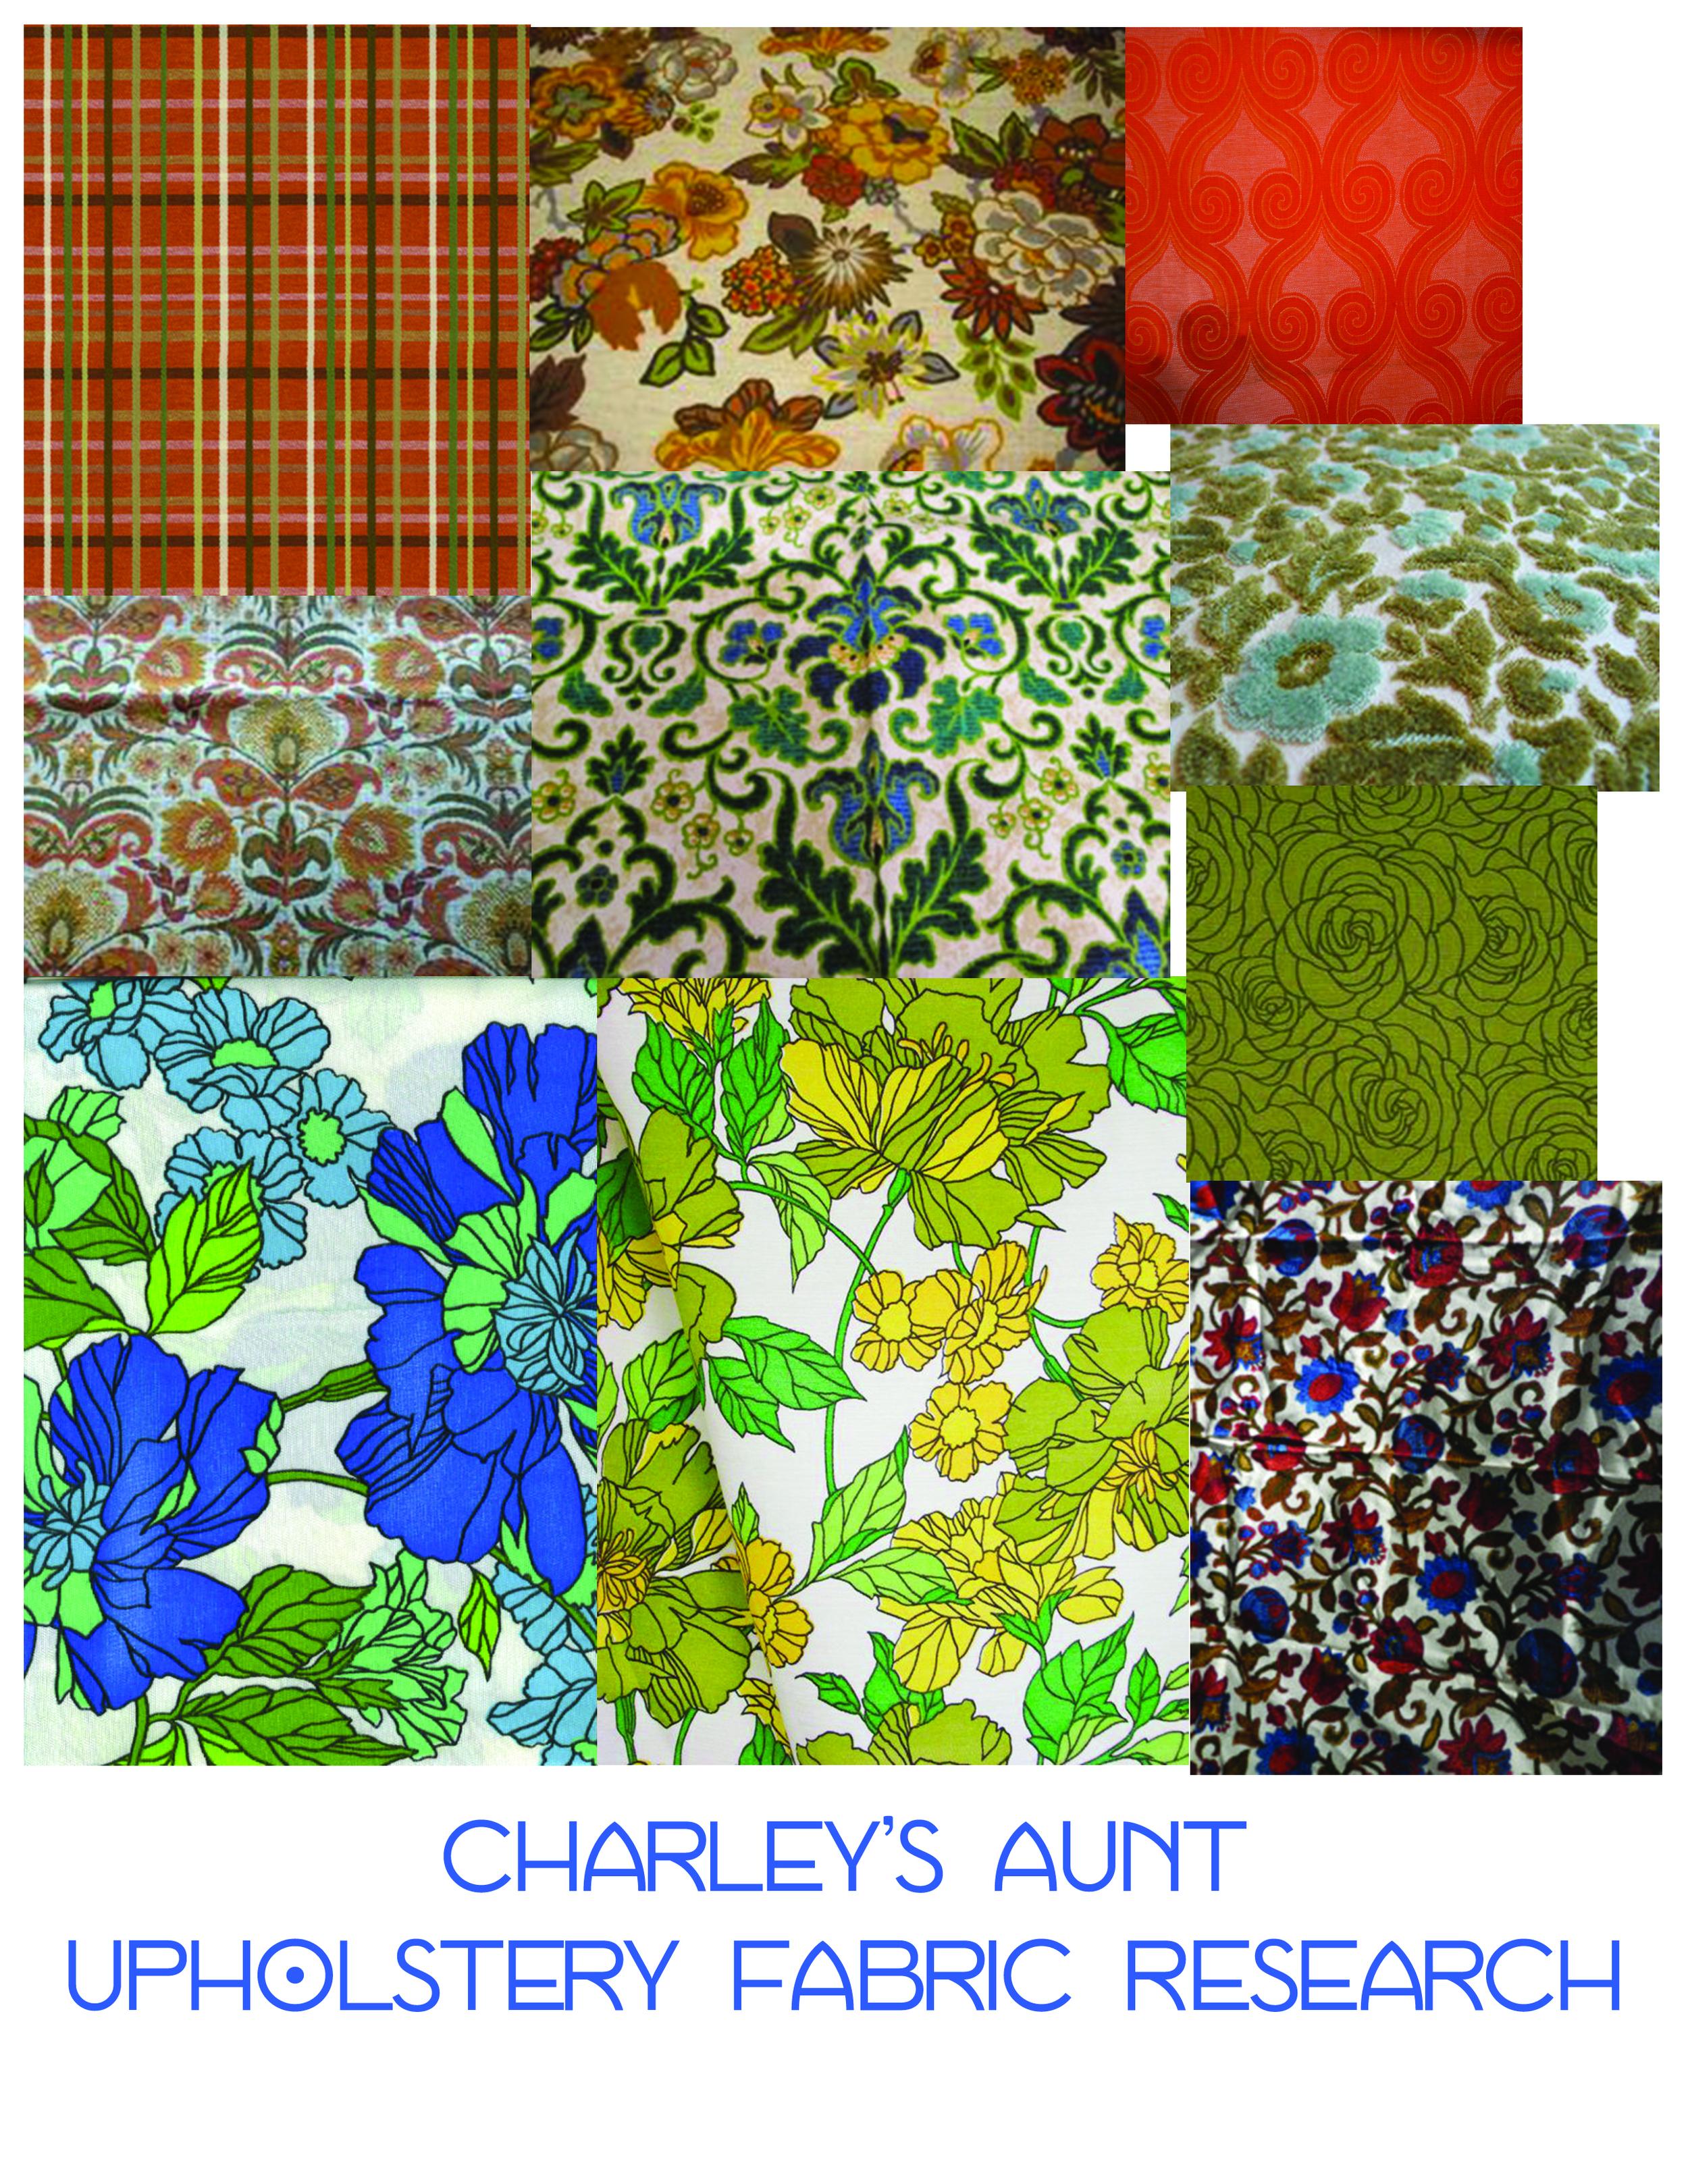 charleys_aunt_fabric_collage.jpg